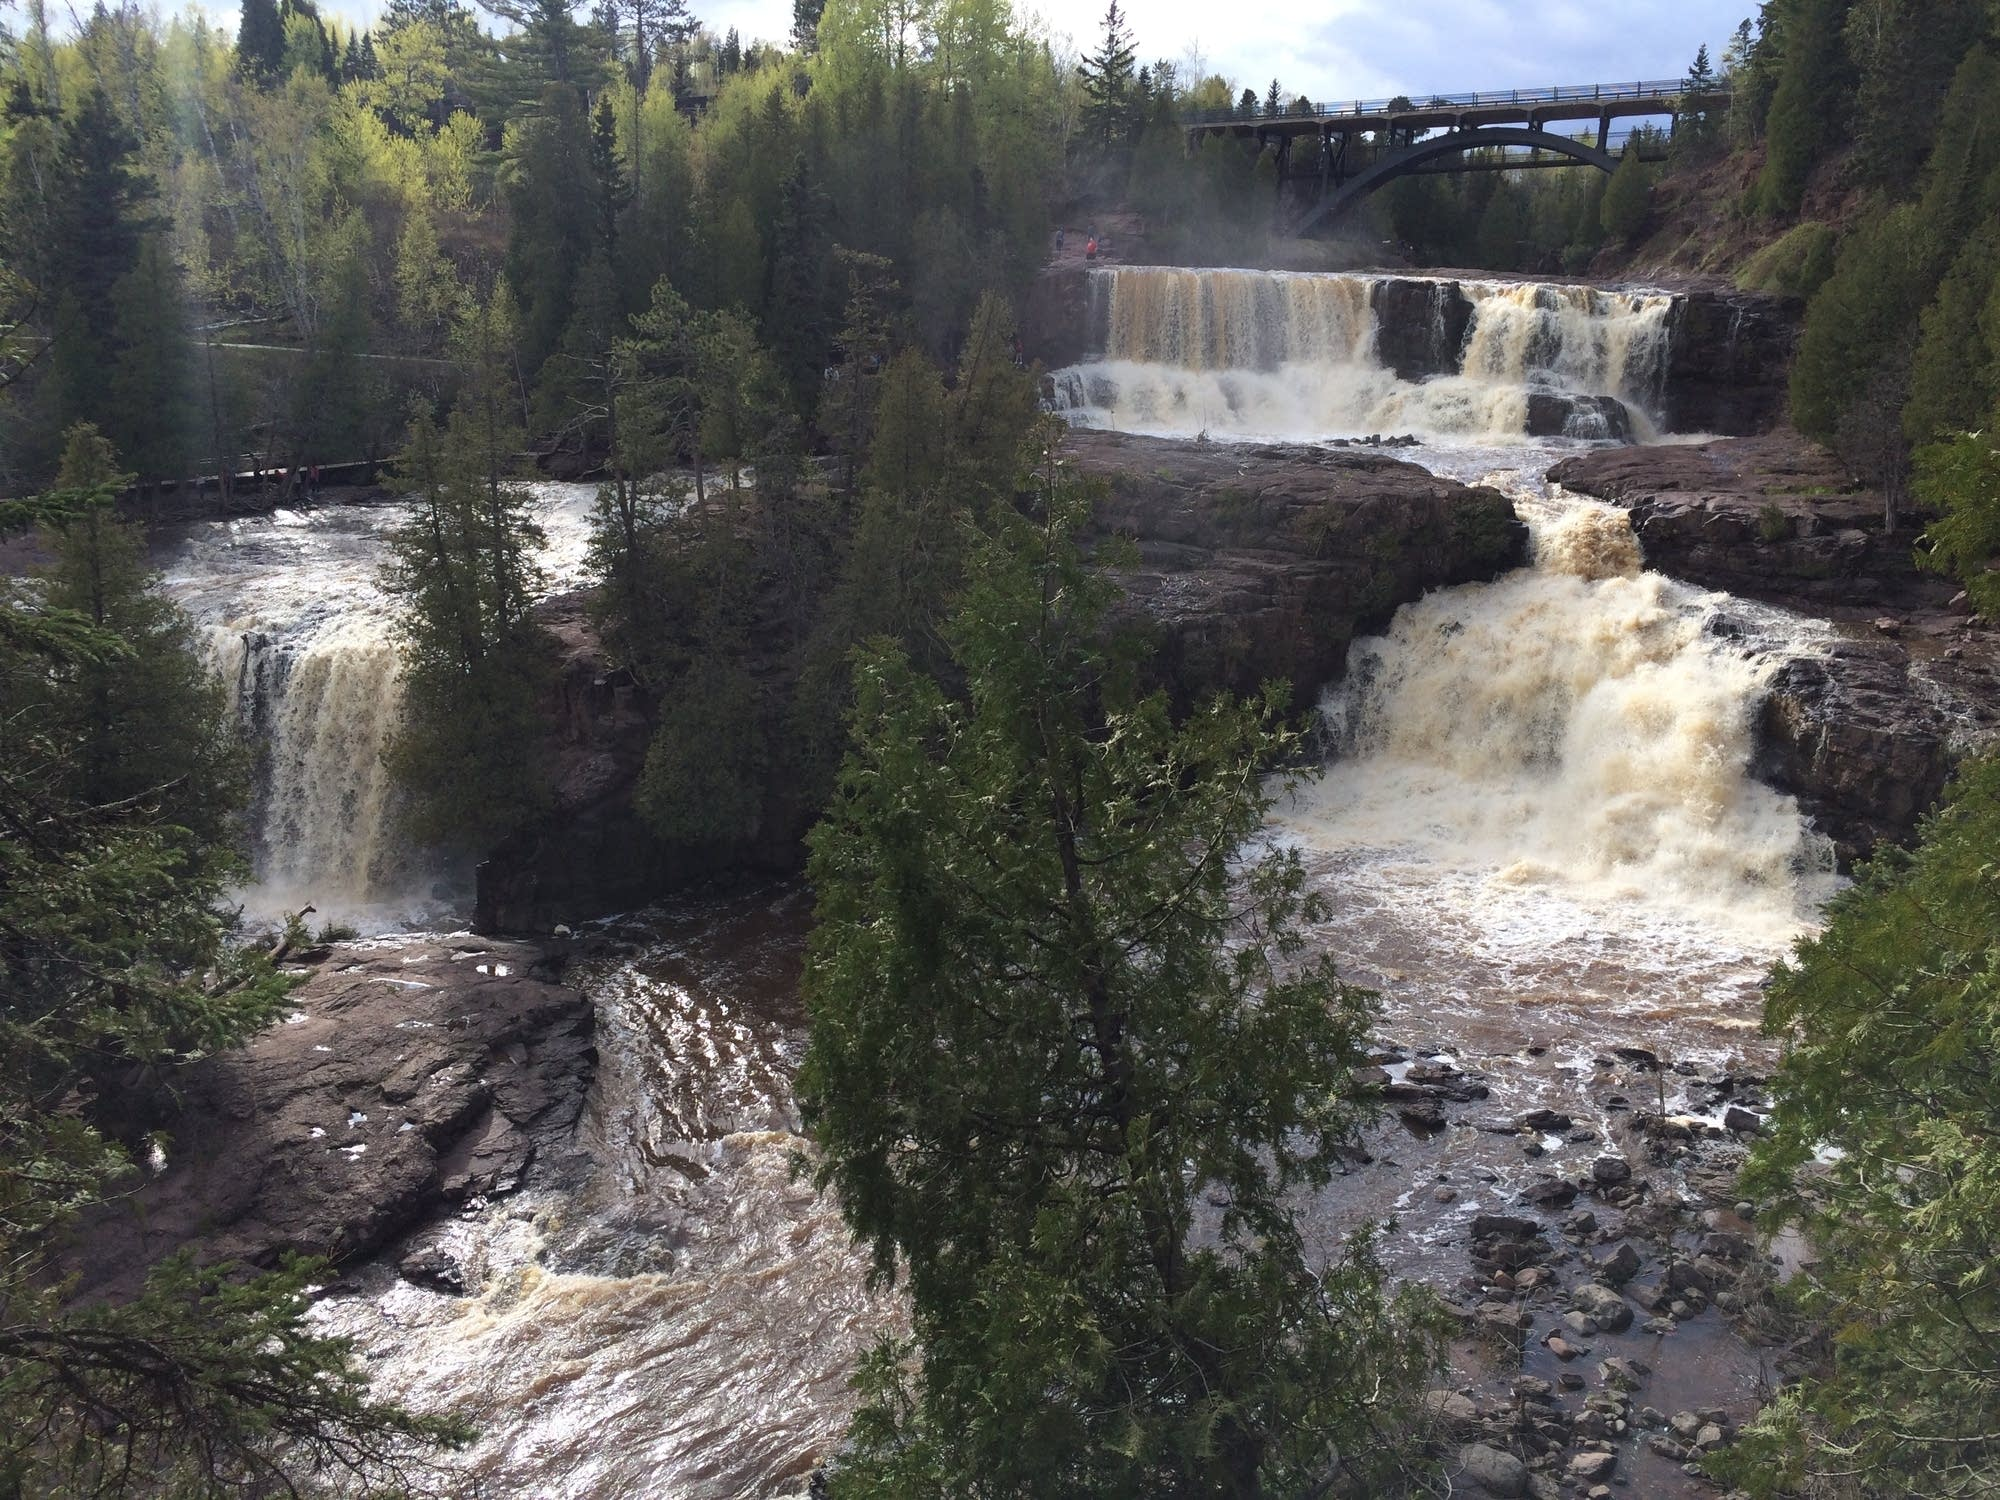 Waterfalls at Gooseberry Falls State Park in Two Harbors Minn